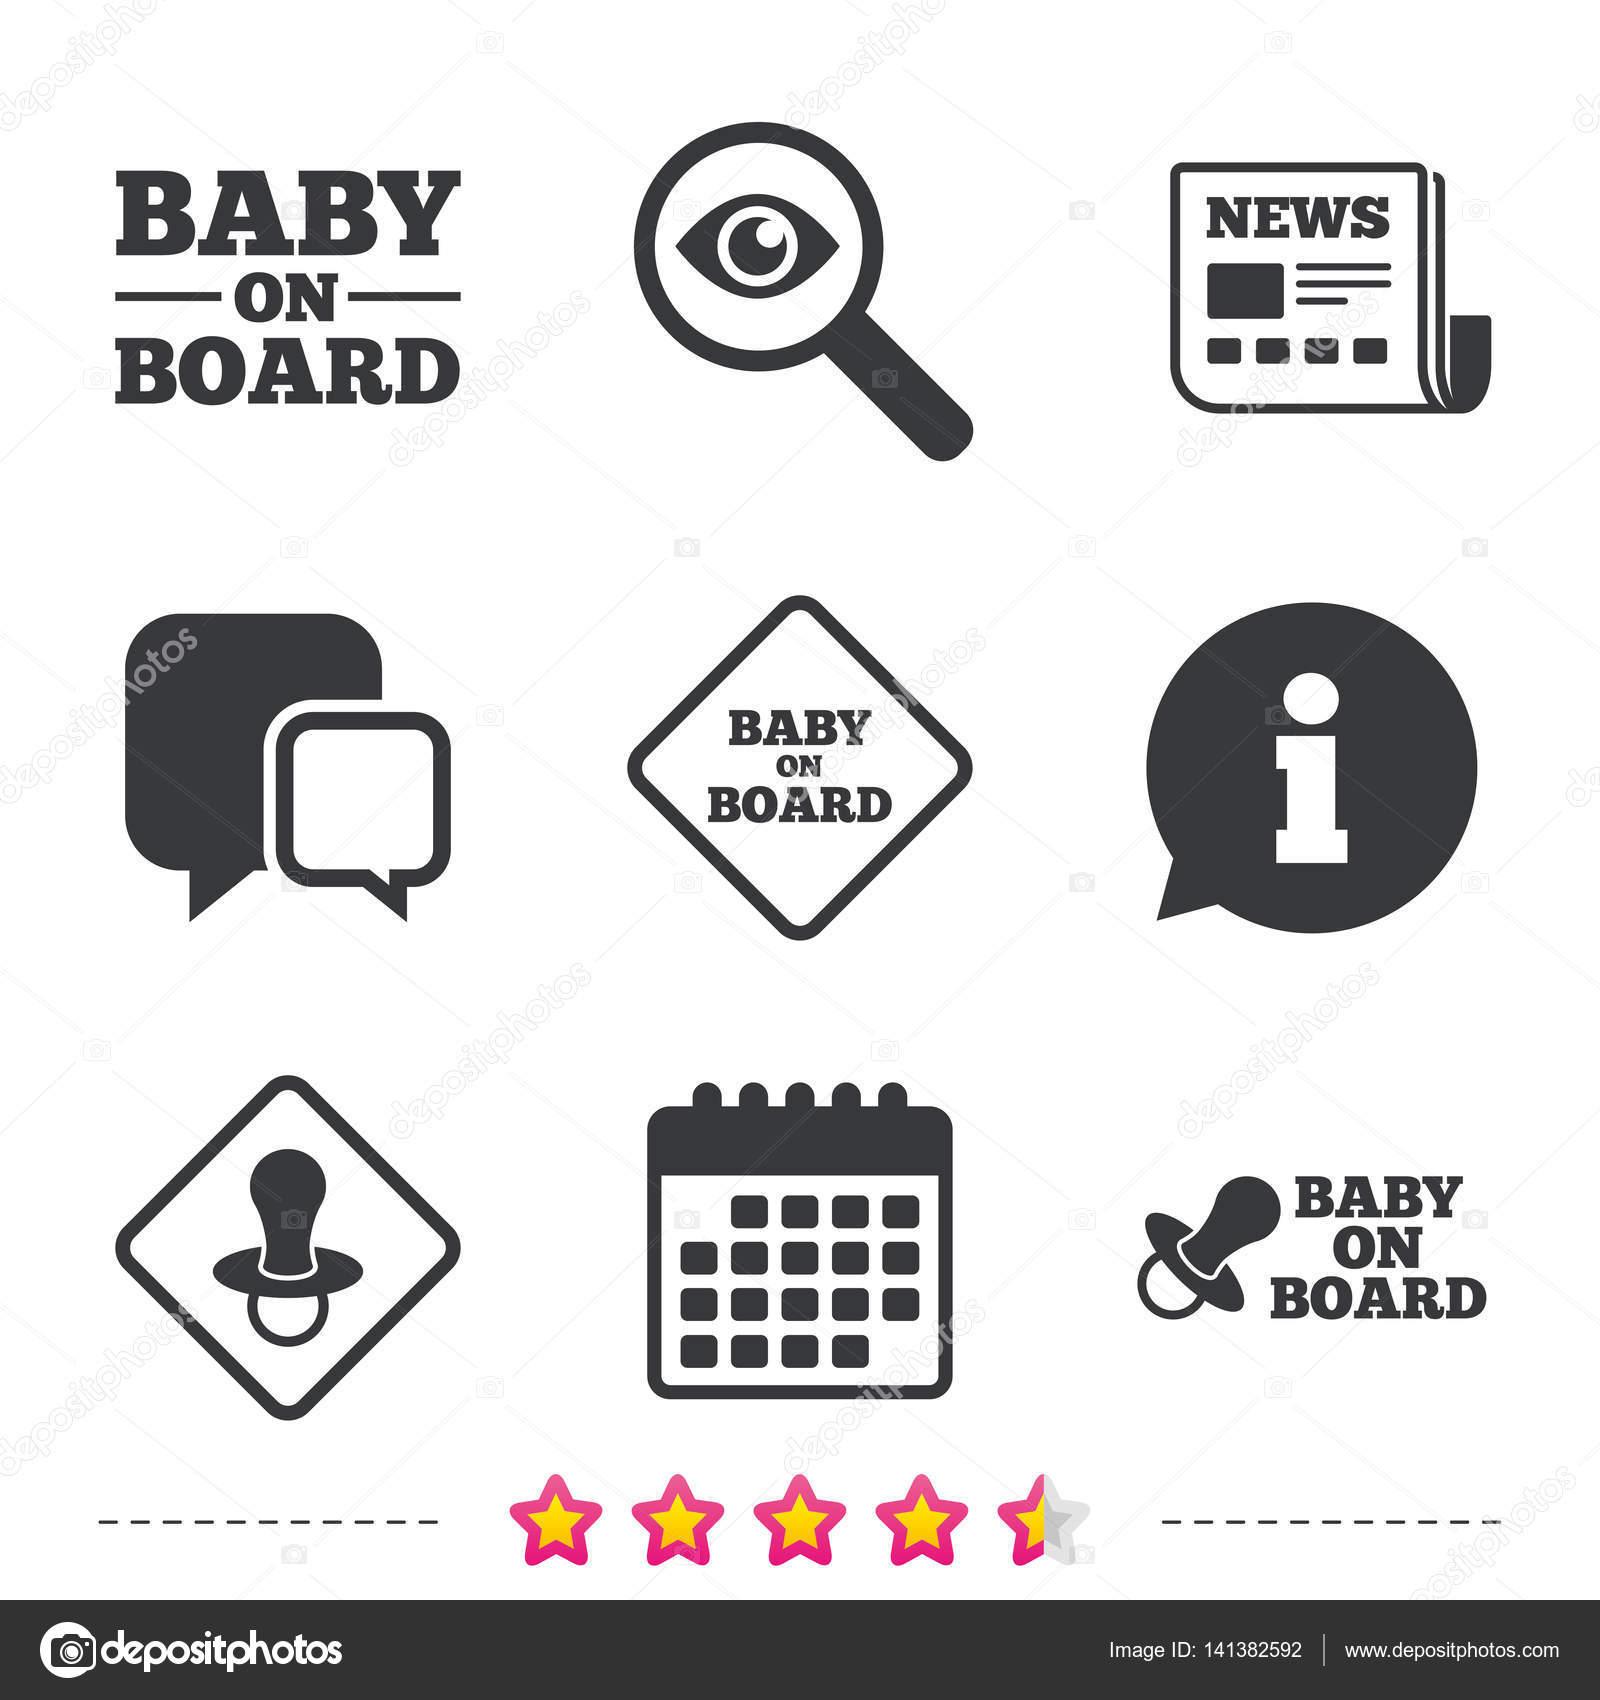 Baby on board icons — Stock Vector © Blankstock #141382592